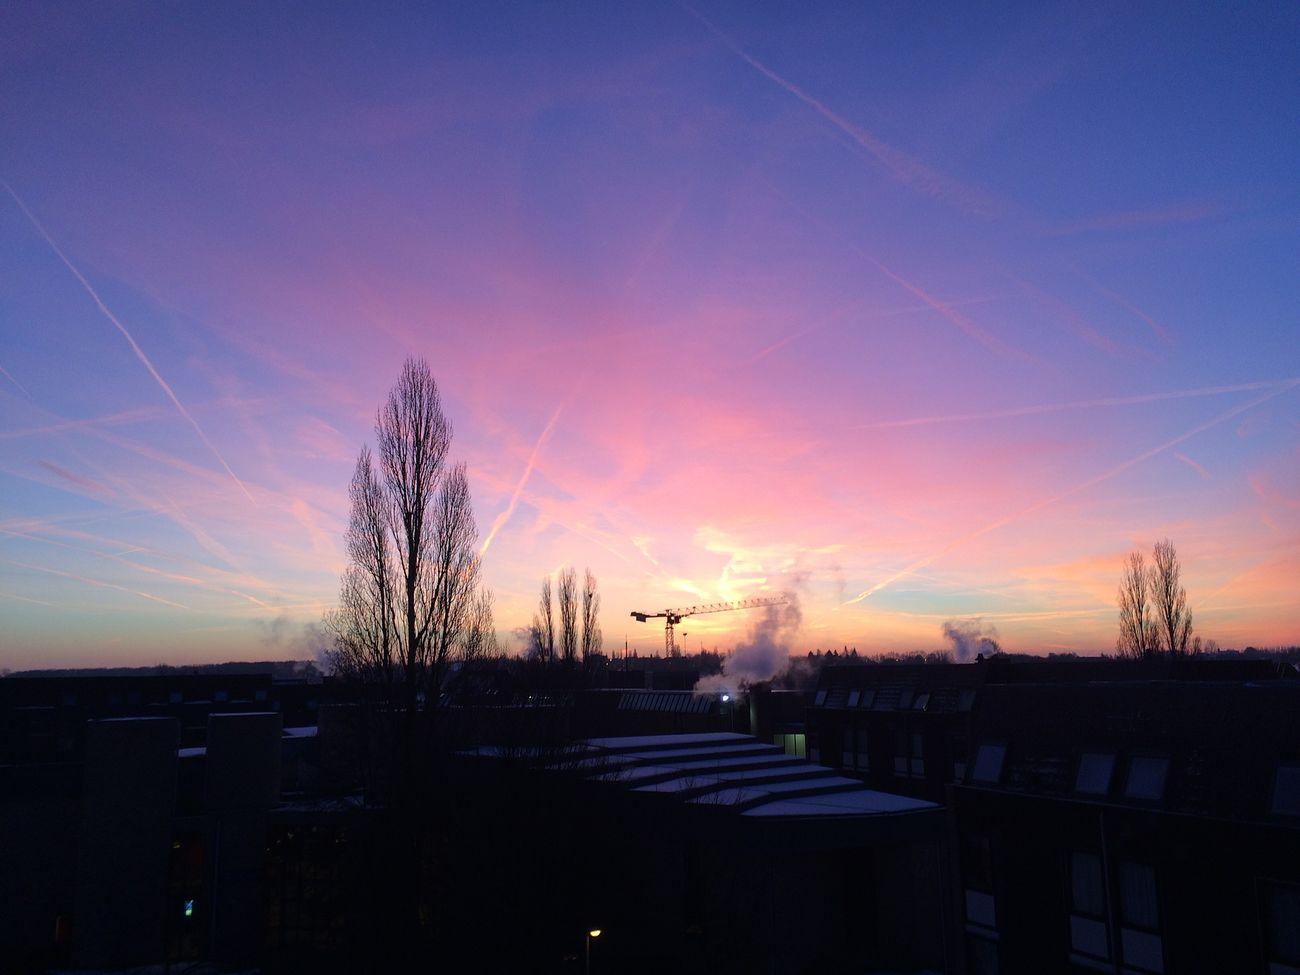 Louvainlaneuve Nofilter Belgium. Belgique. Belgie. Belgien. Etc. Urban Landscape Sunshine Kot Vieuw